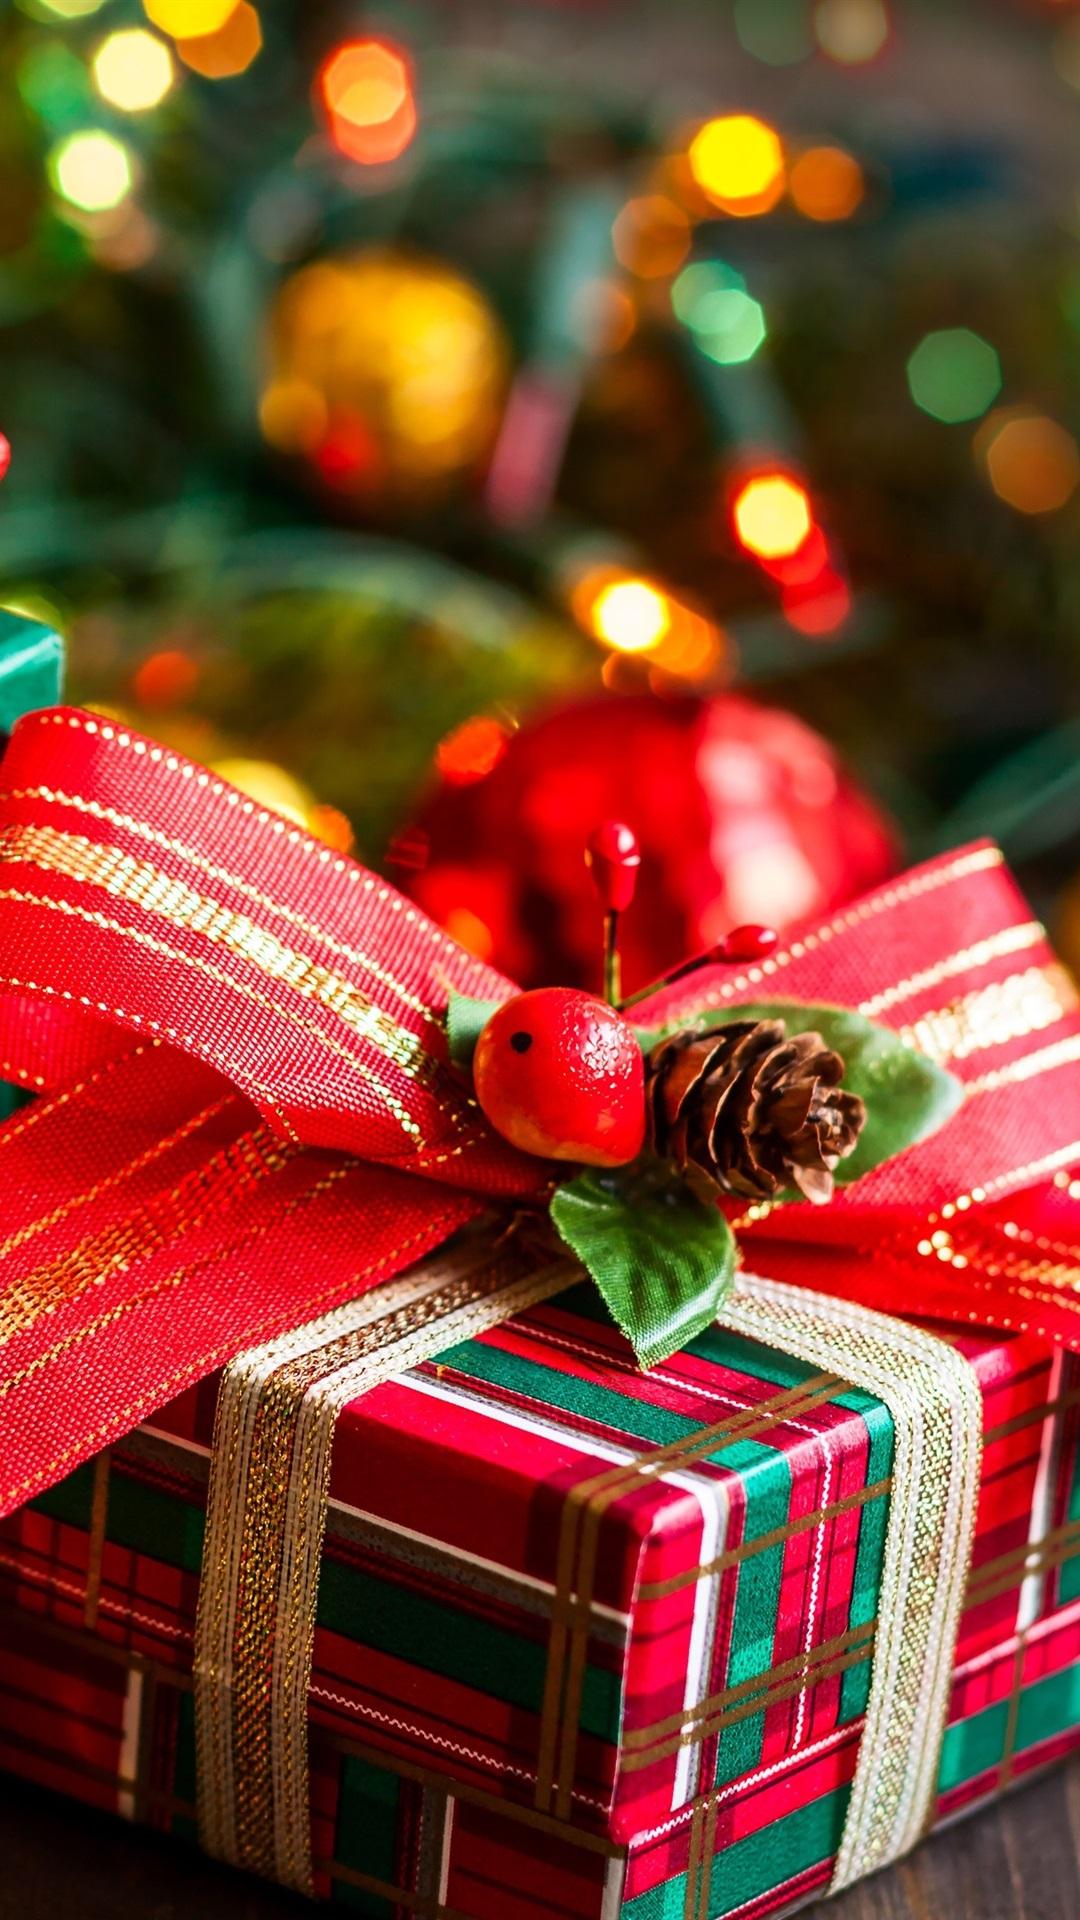 Iphone Wallpaper Gifts Berries Fir Twigs Christmas Sapin Noel Fond D Ecran Iphone 1080x1920 Wallpaper Teahub Io